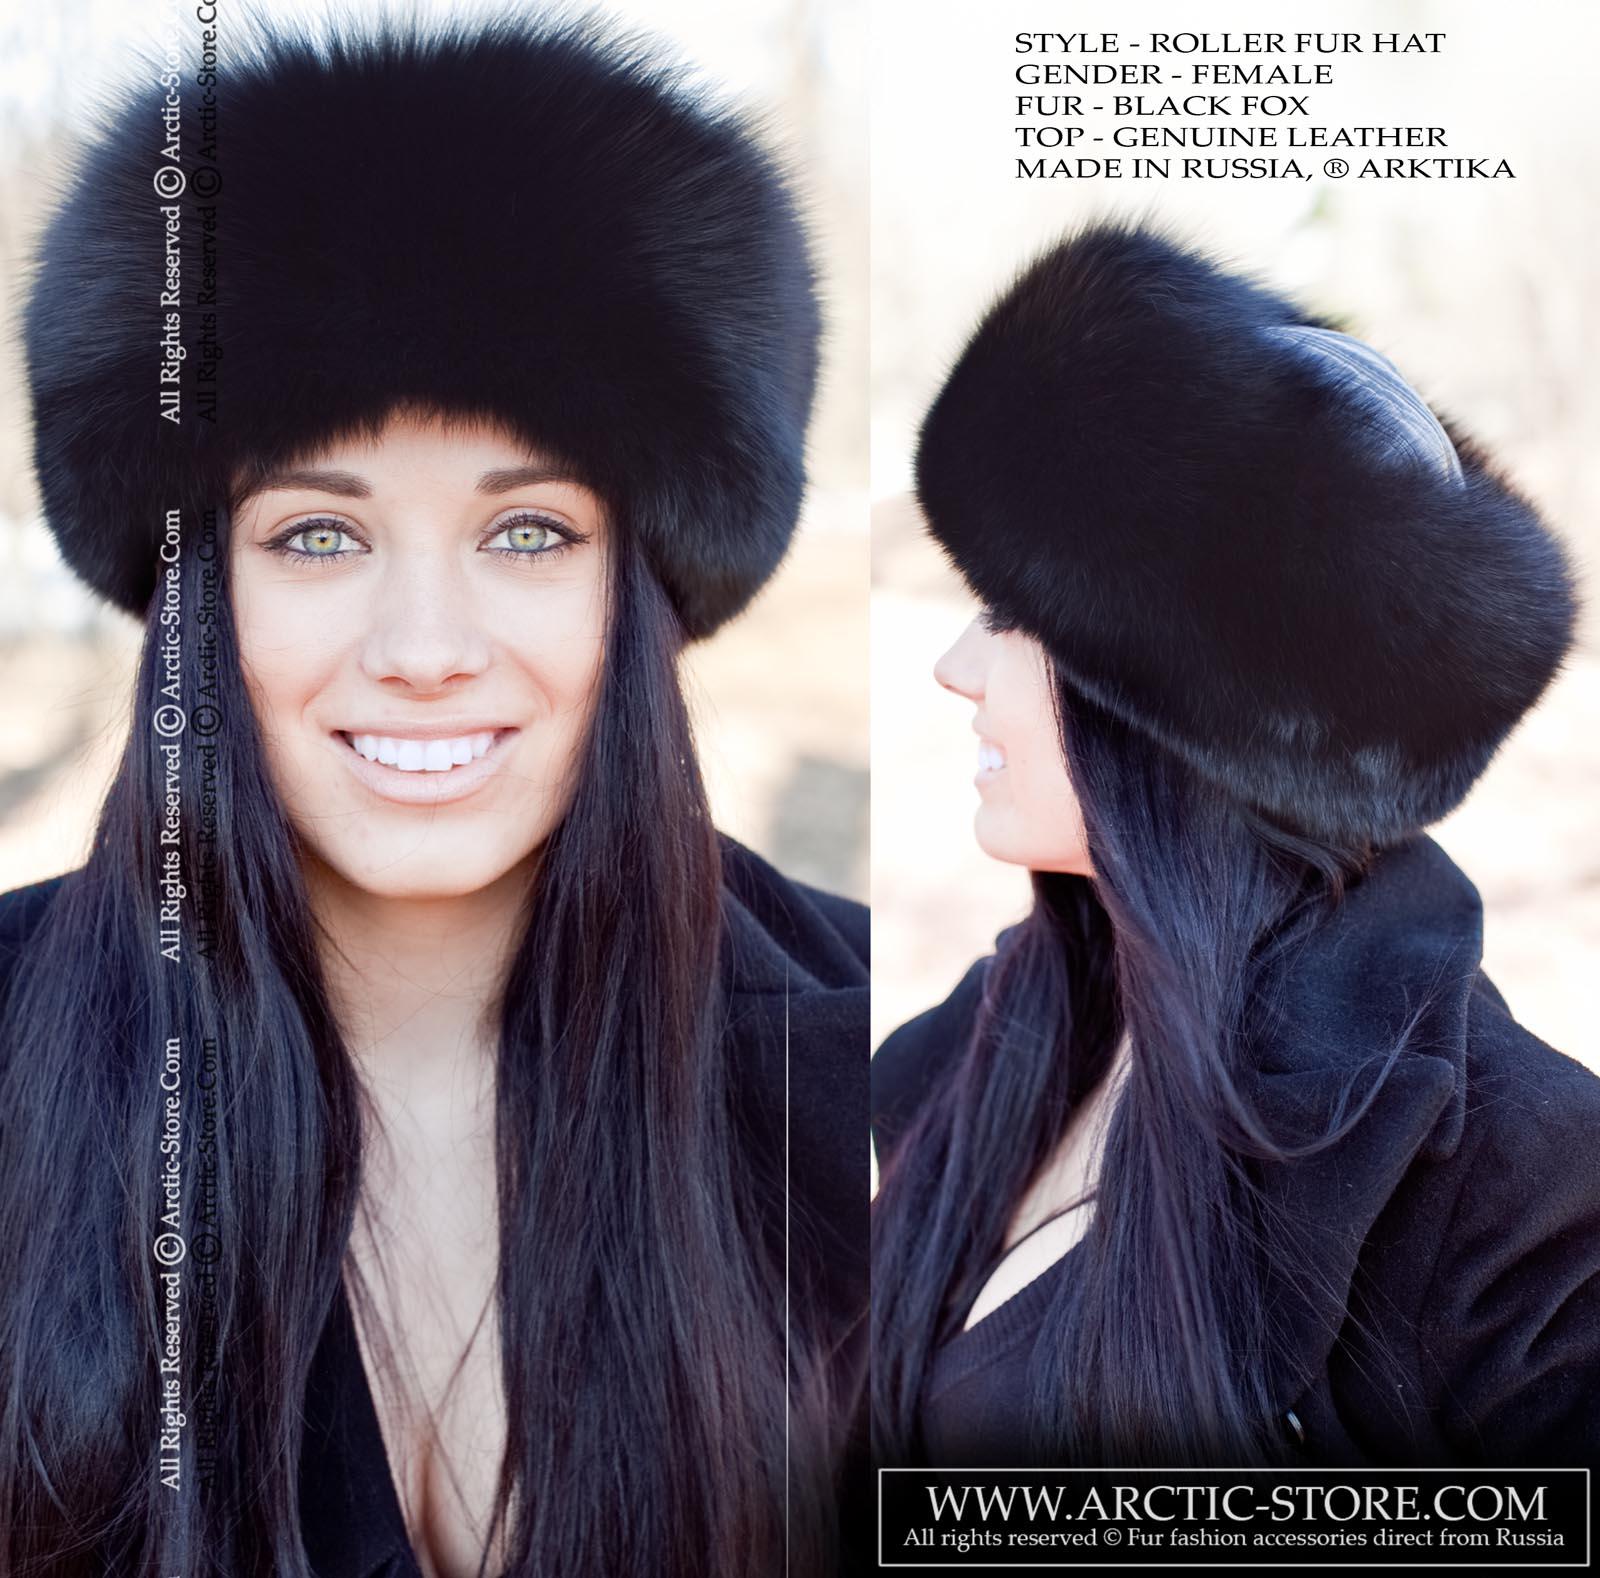 9a1c9069 Roller fur hat - black fox shapka - arctic-store